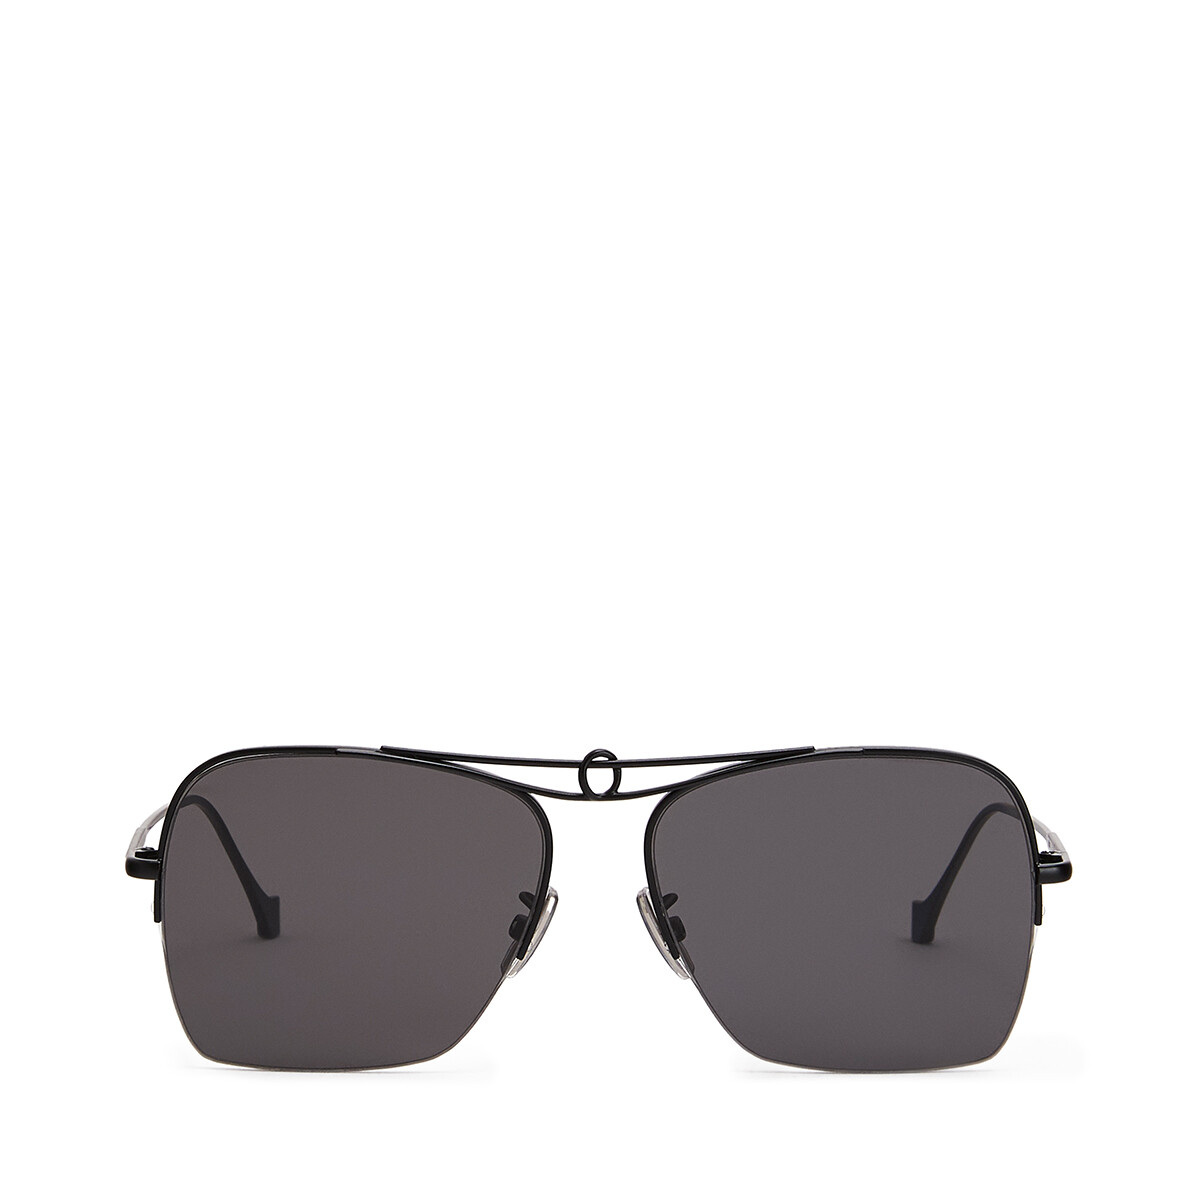 LOEWE Knot Pilot Square Sunglasses Black Matte/Smoke front